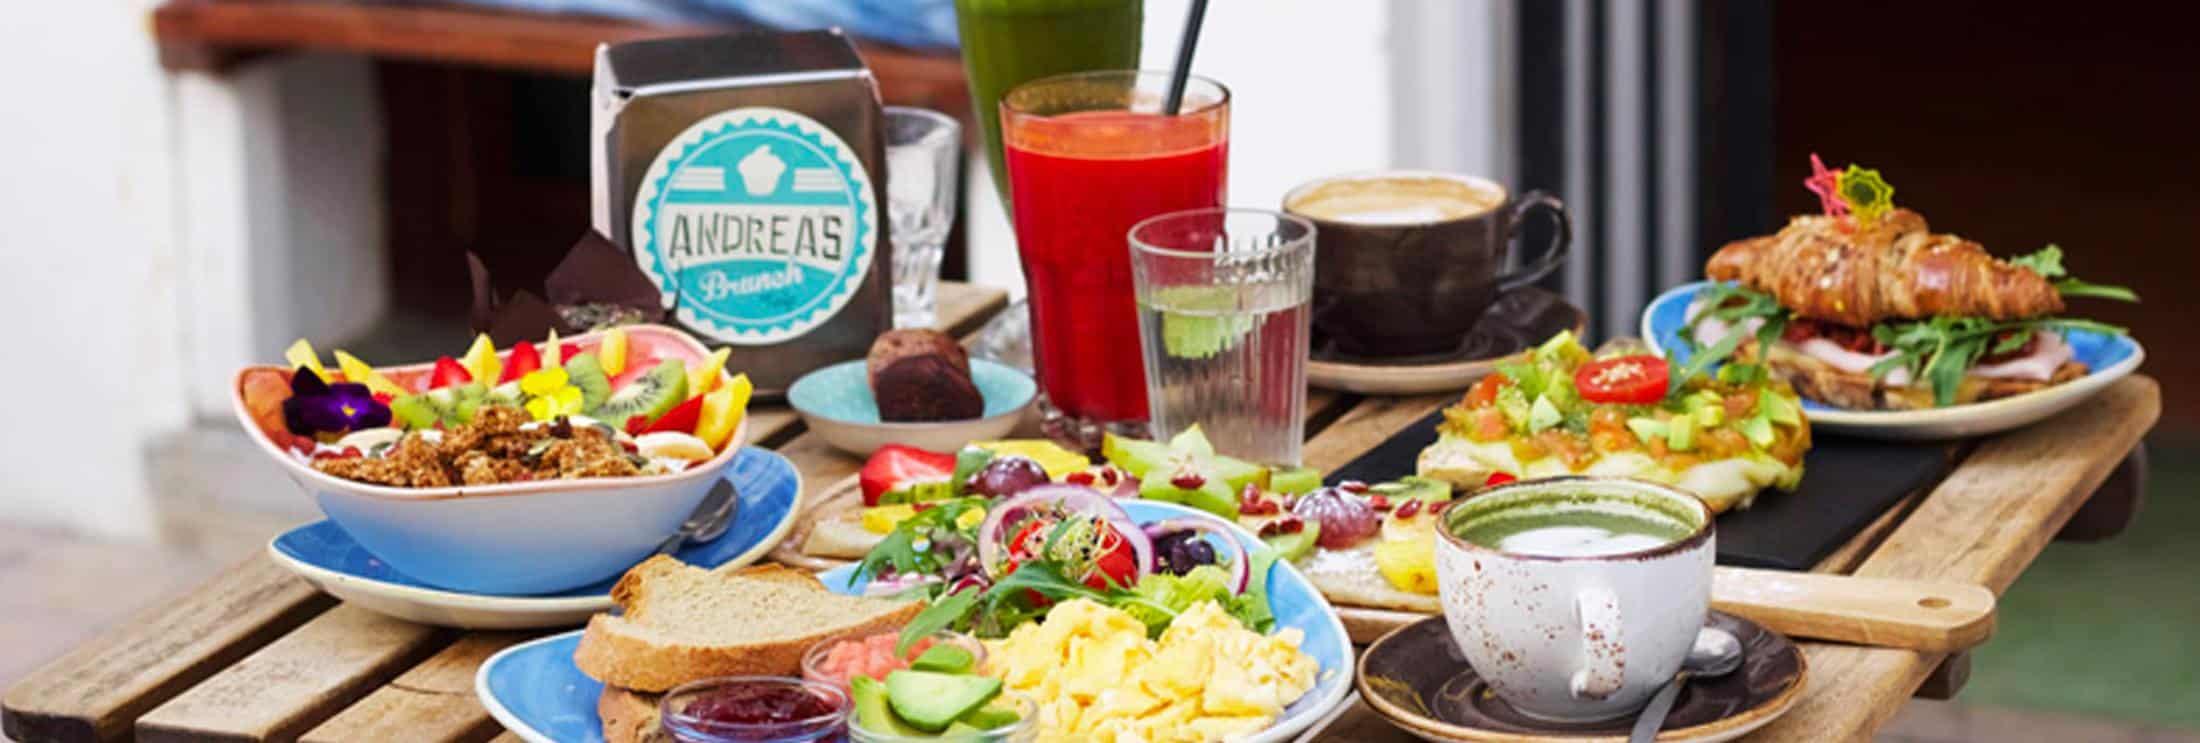 Andrea's Brunch-Breakfast-Tarifa-Petit-dejuner